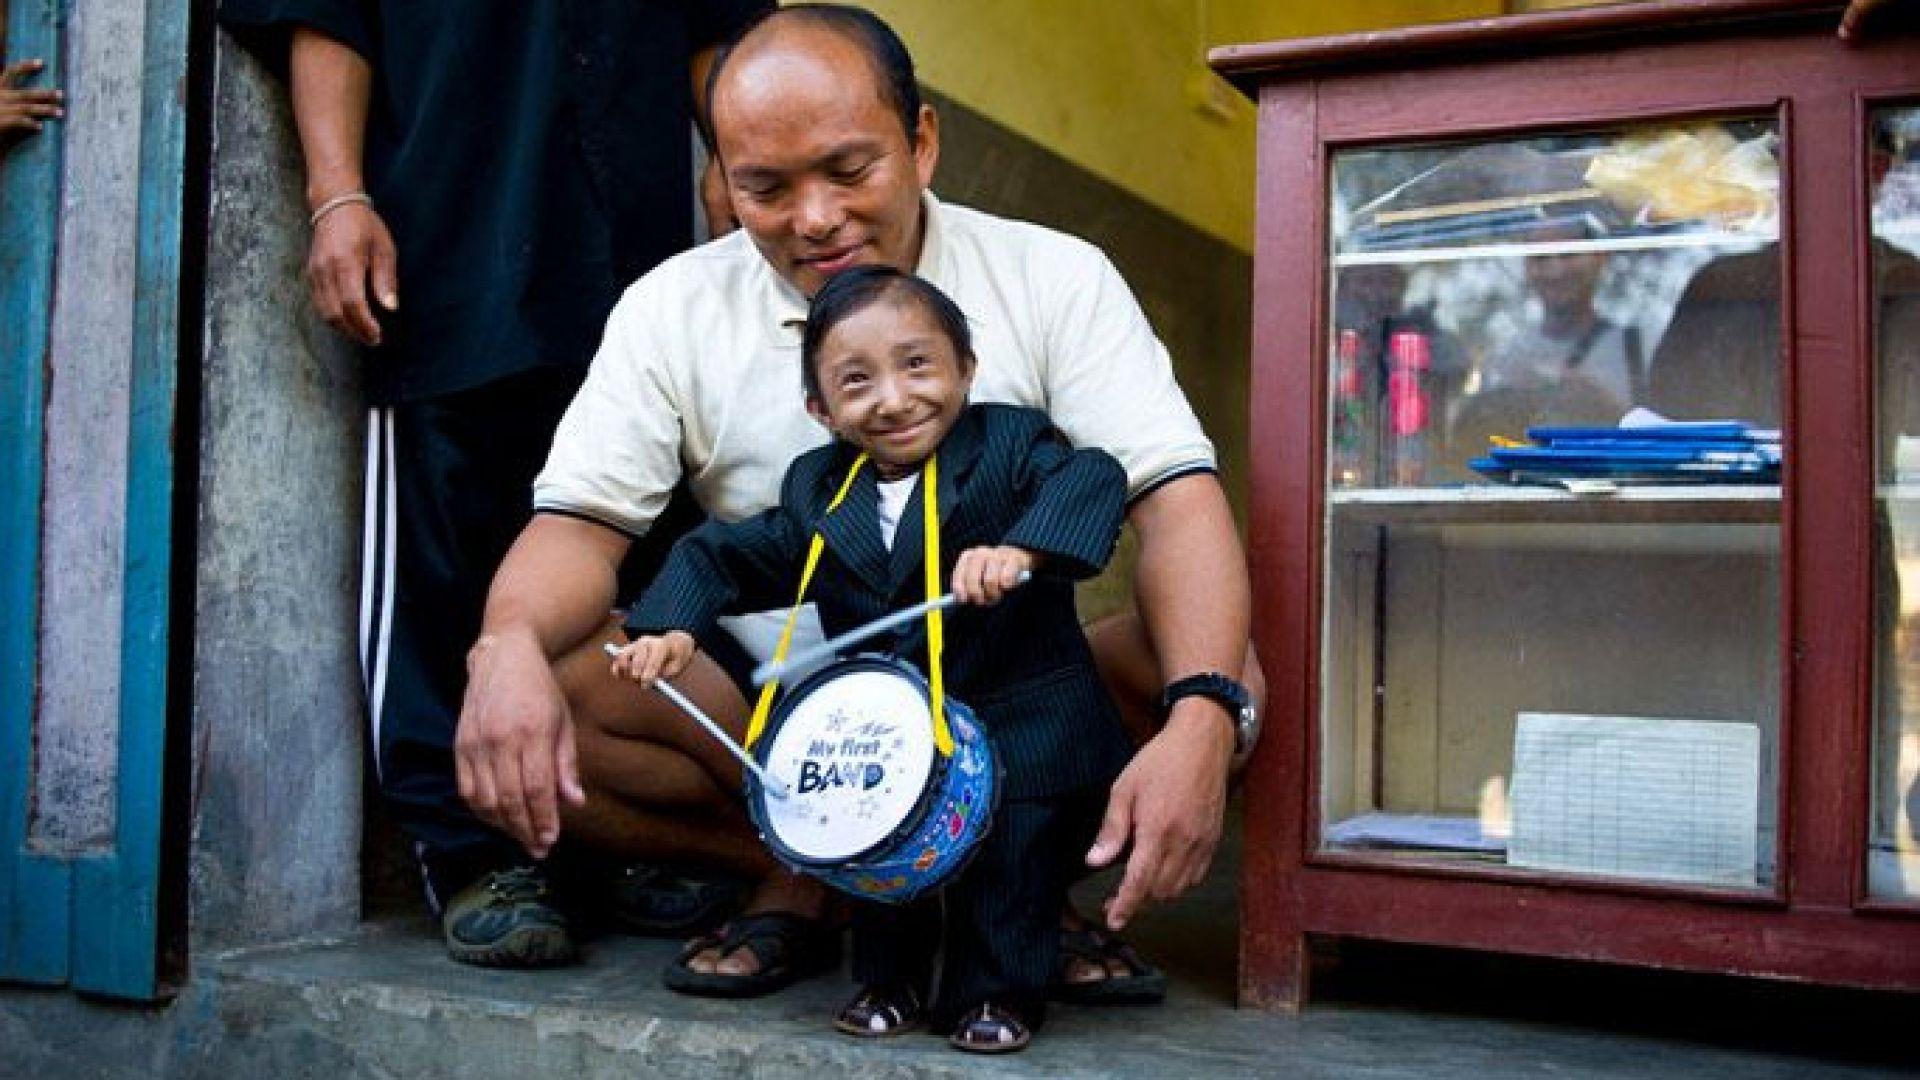 Кхагендра Тхапа Магар от Непал - рекордьор на Гинес за